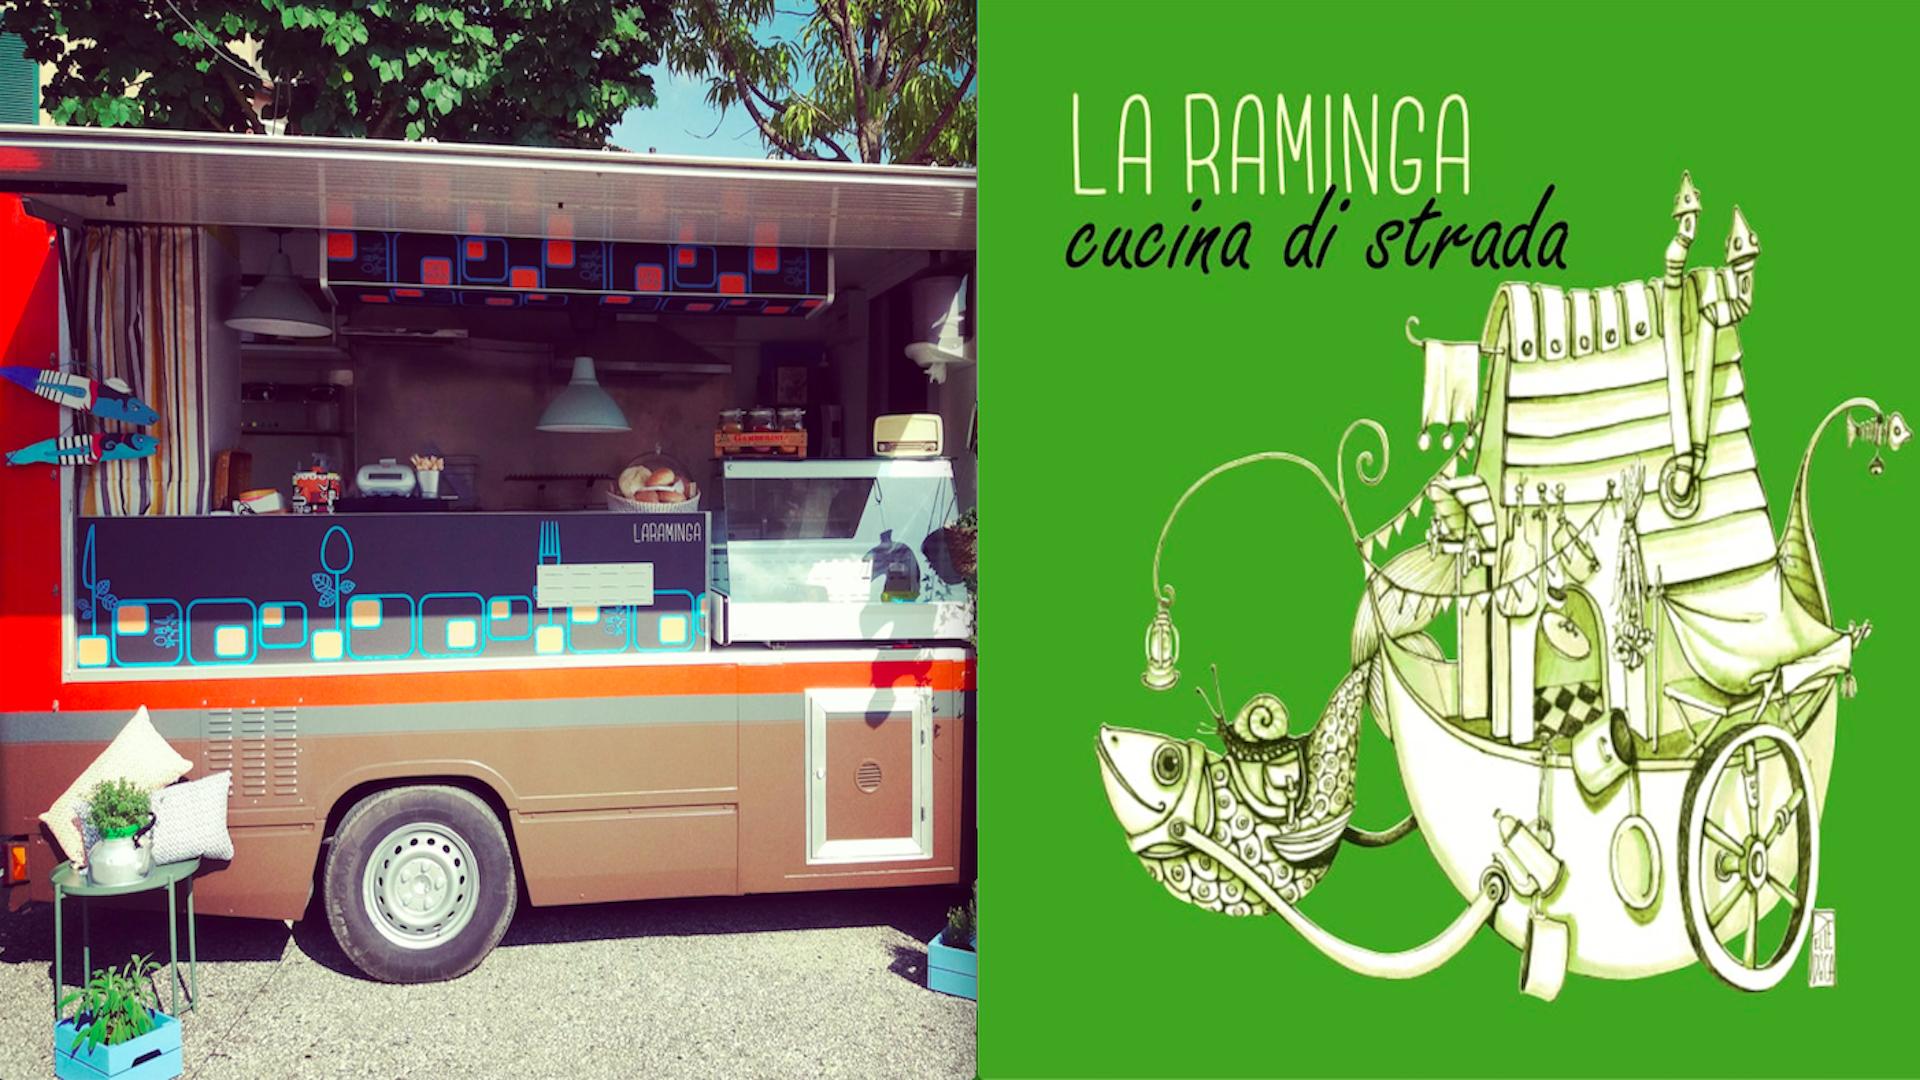 La Raminga: cucina di strada - Riciblog